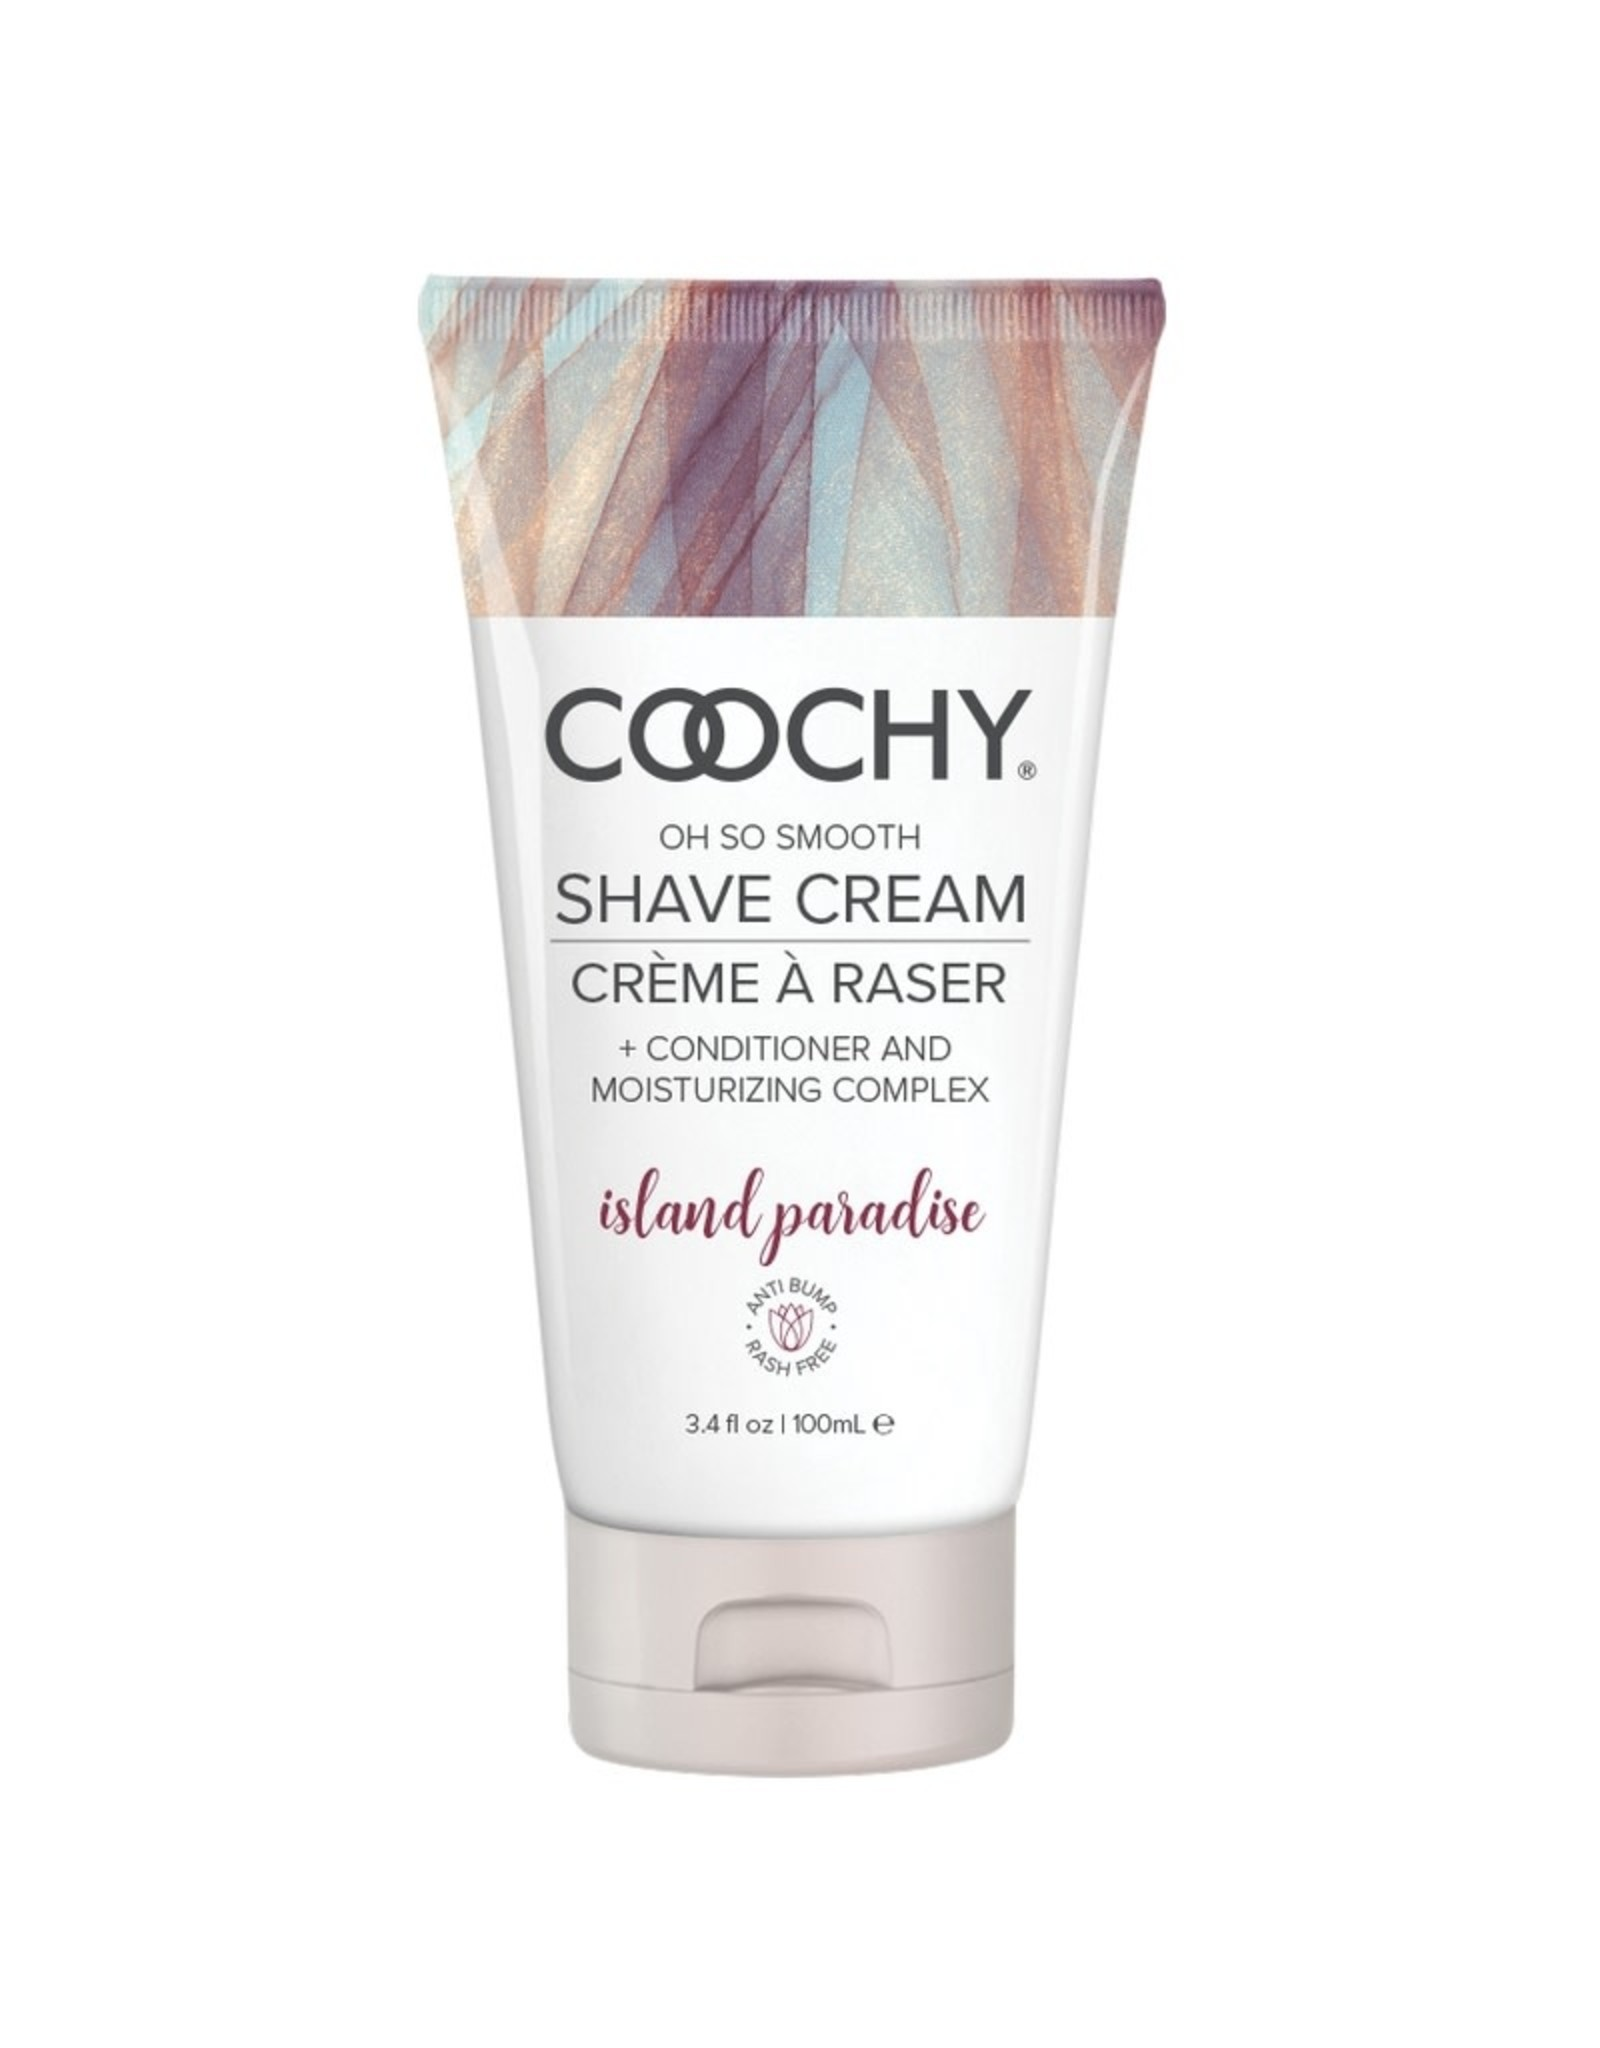 Coochy Coochy - Island Paradise (3.4 oz)